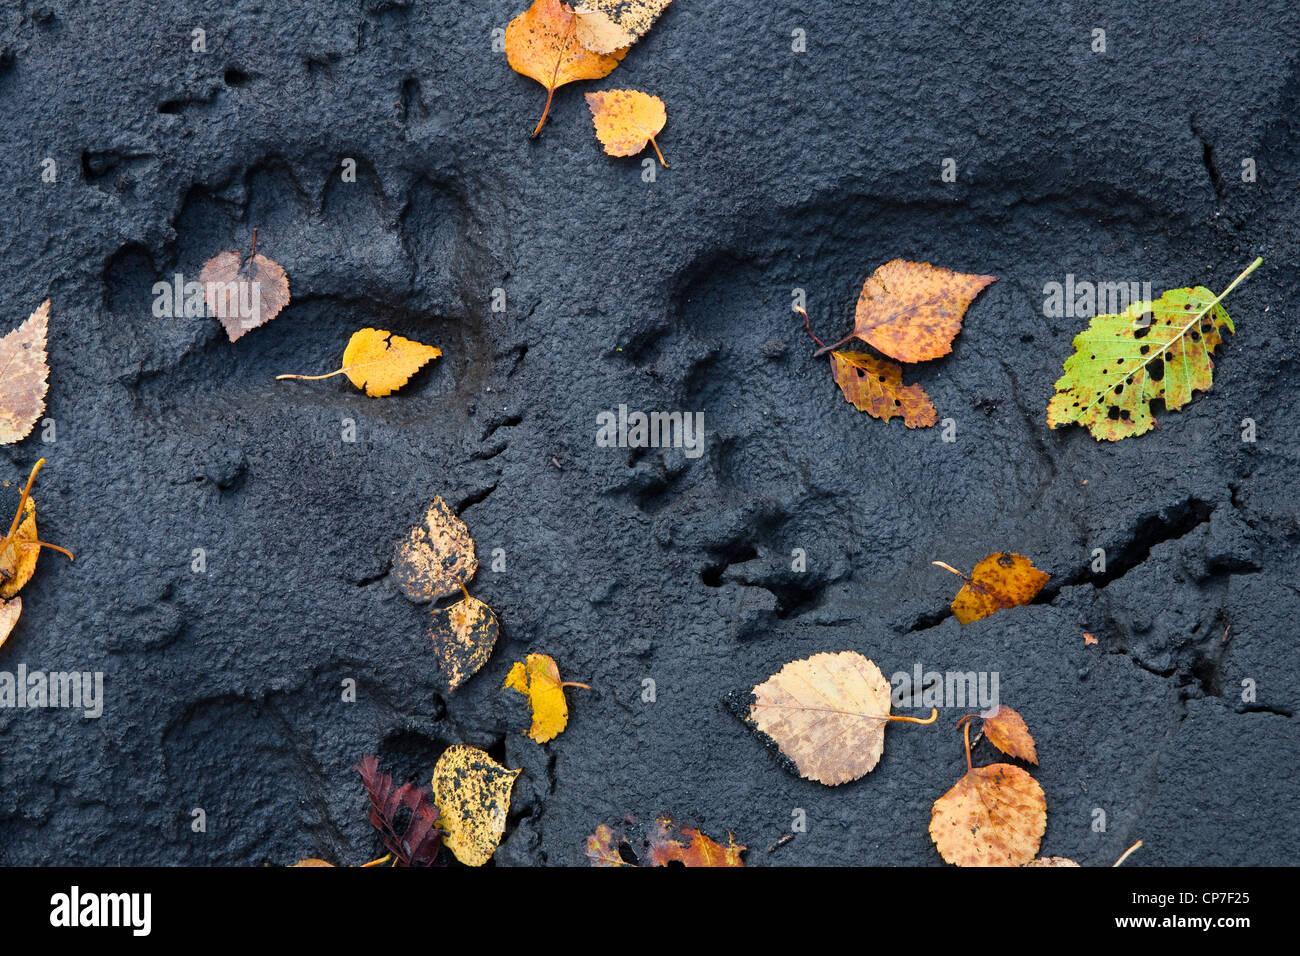 Fall leaves resting on bear tracks along Eagle River, Chugach State Park, Southcentral Alaska, Autumn - Stock Image